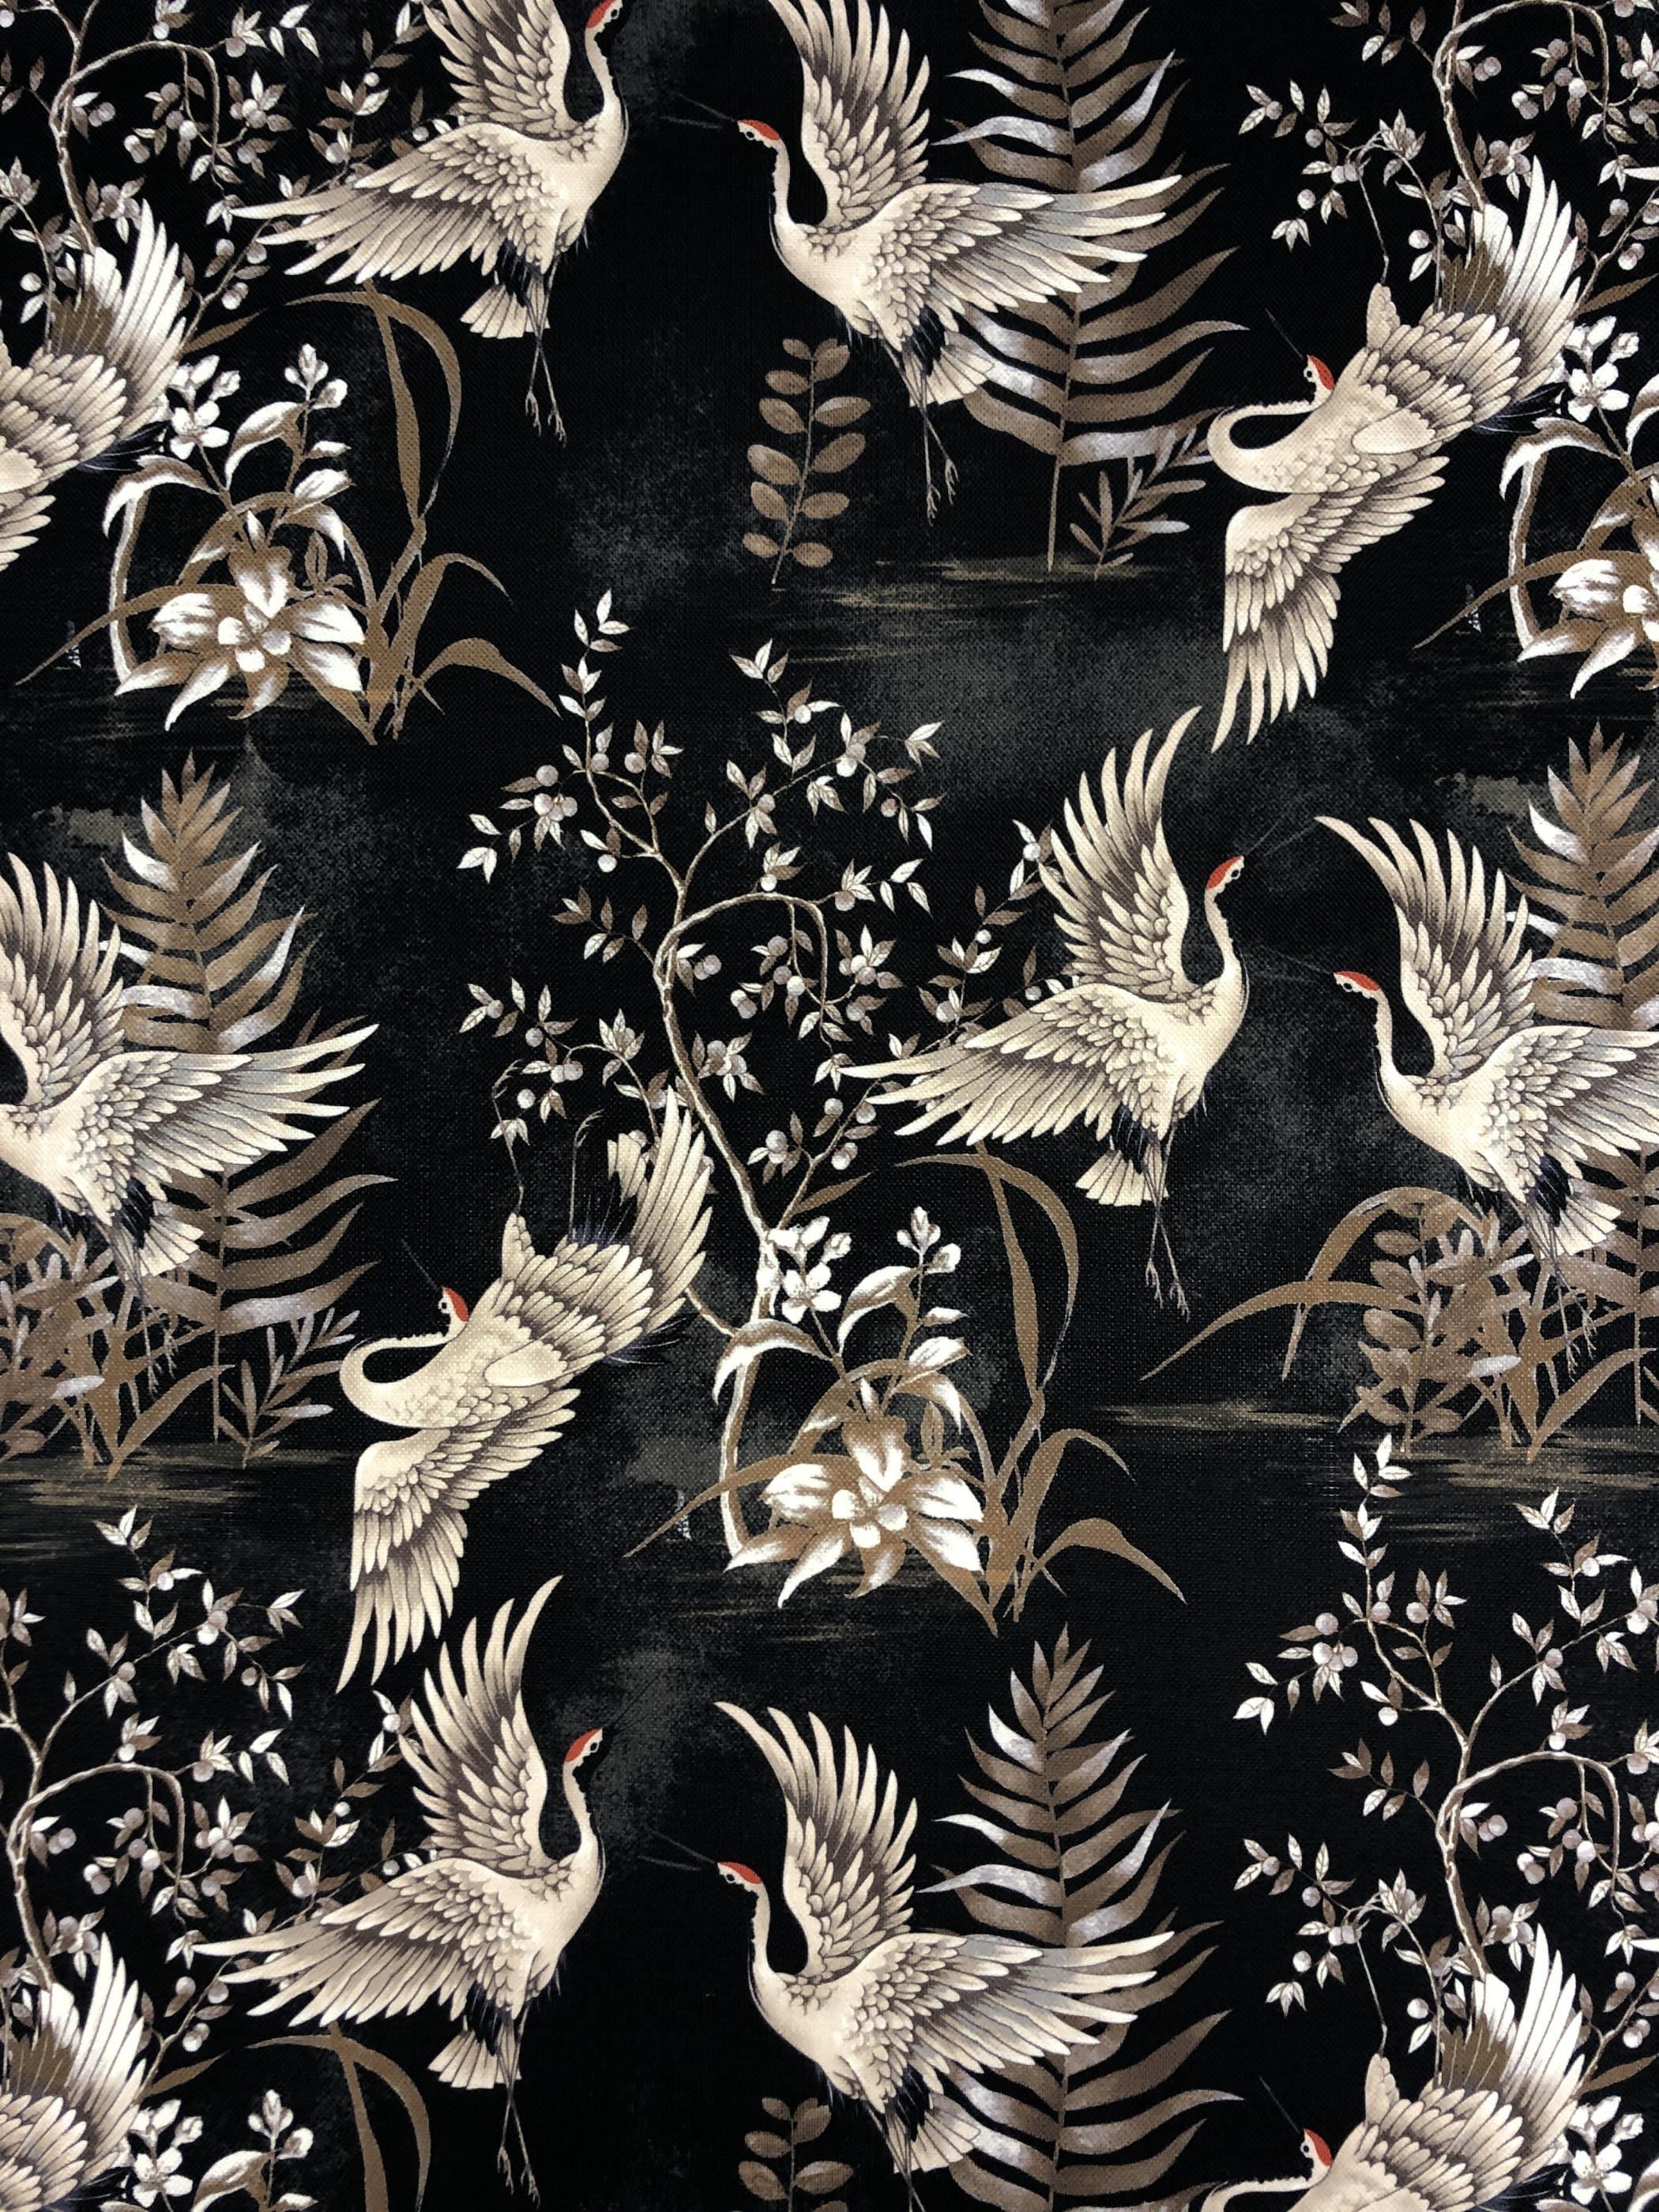 tranor svart mörk hemtextil blommor japanskt tyglust Laholm metervara